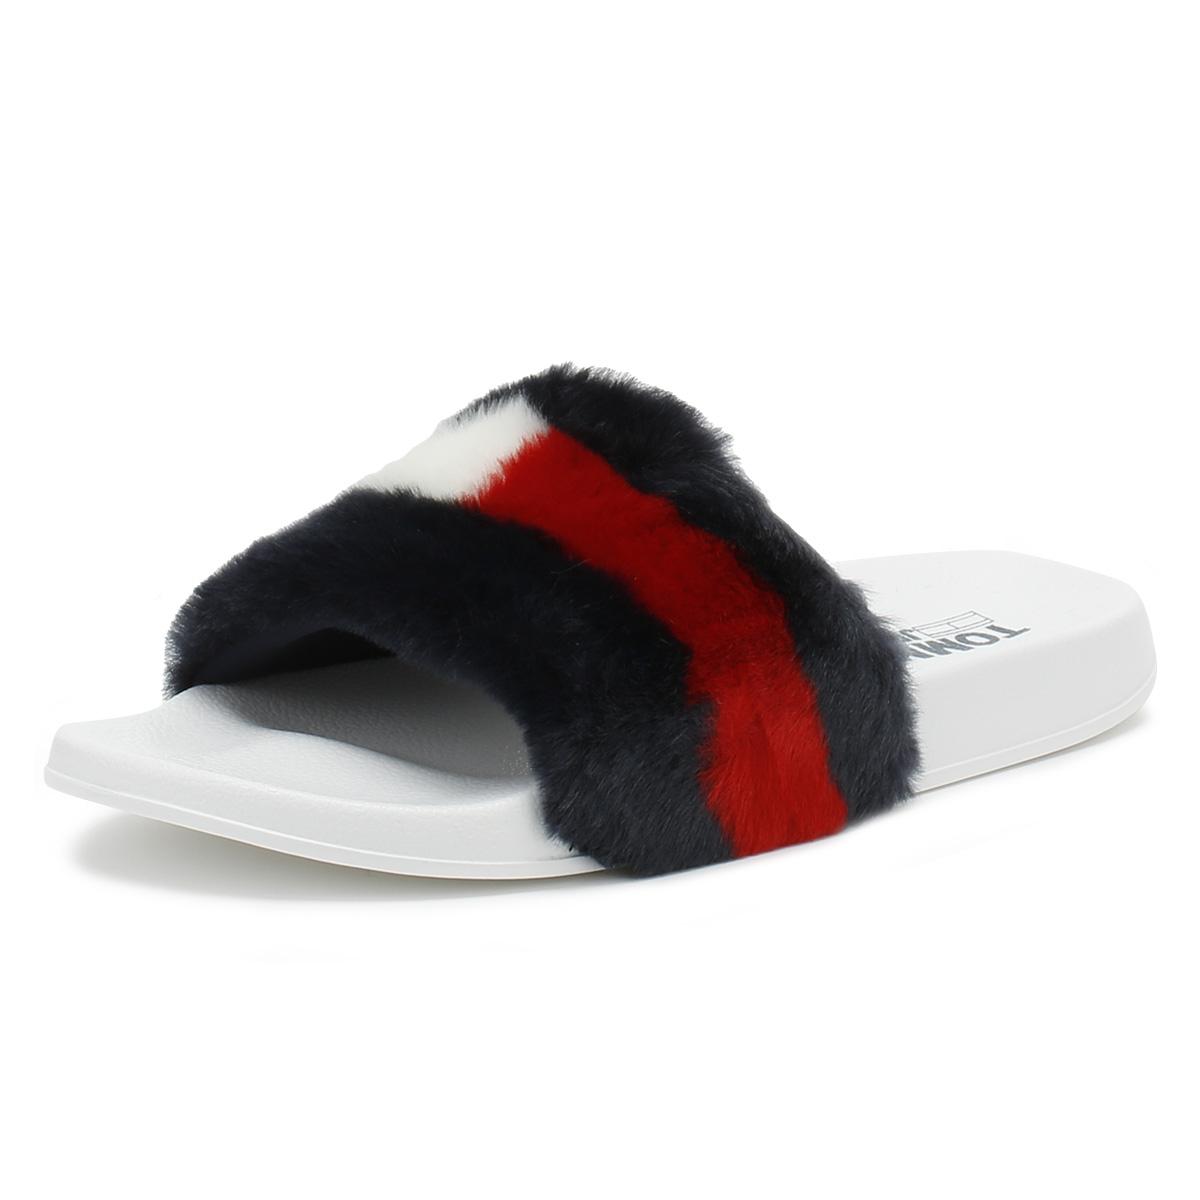 806f1d42f84 Details about Tommy Hilfiger Womens RWB Funny Fur Pool Slides Ladies Summer  Beach Sandals